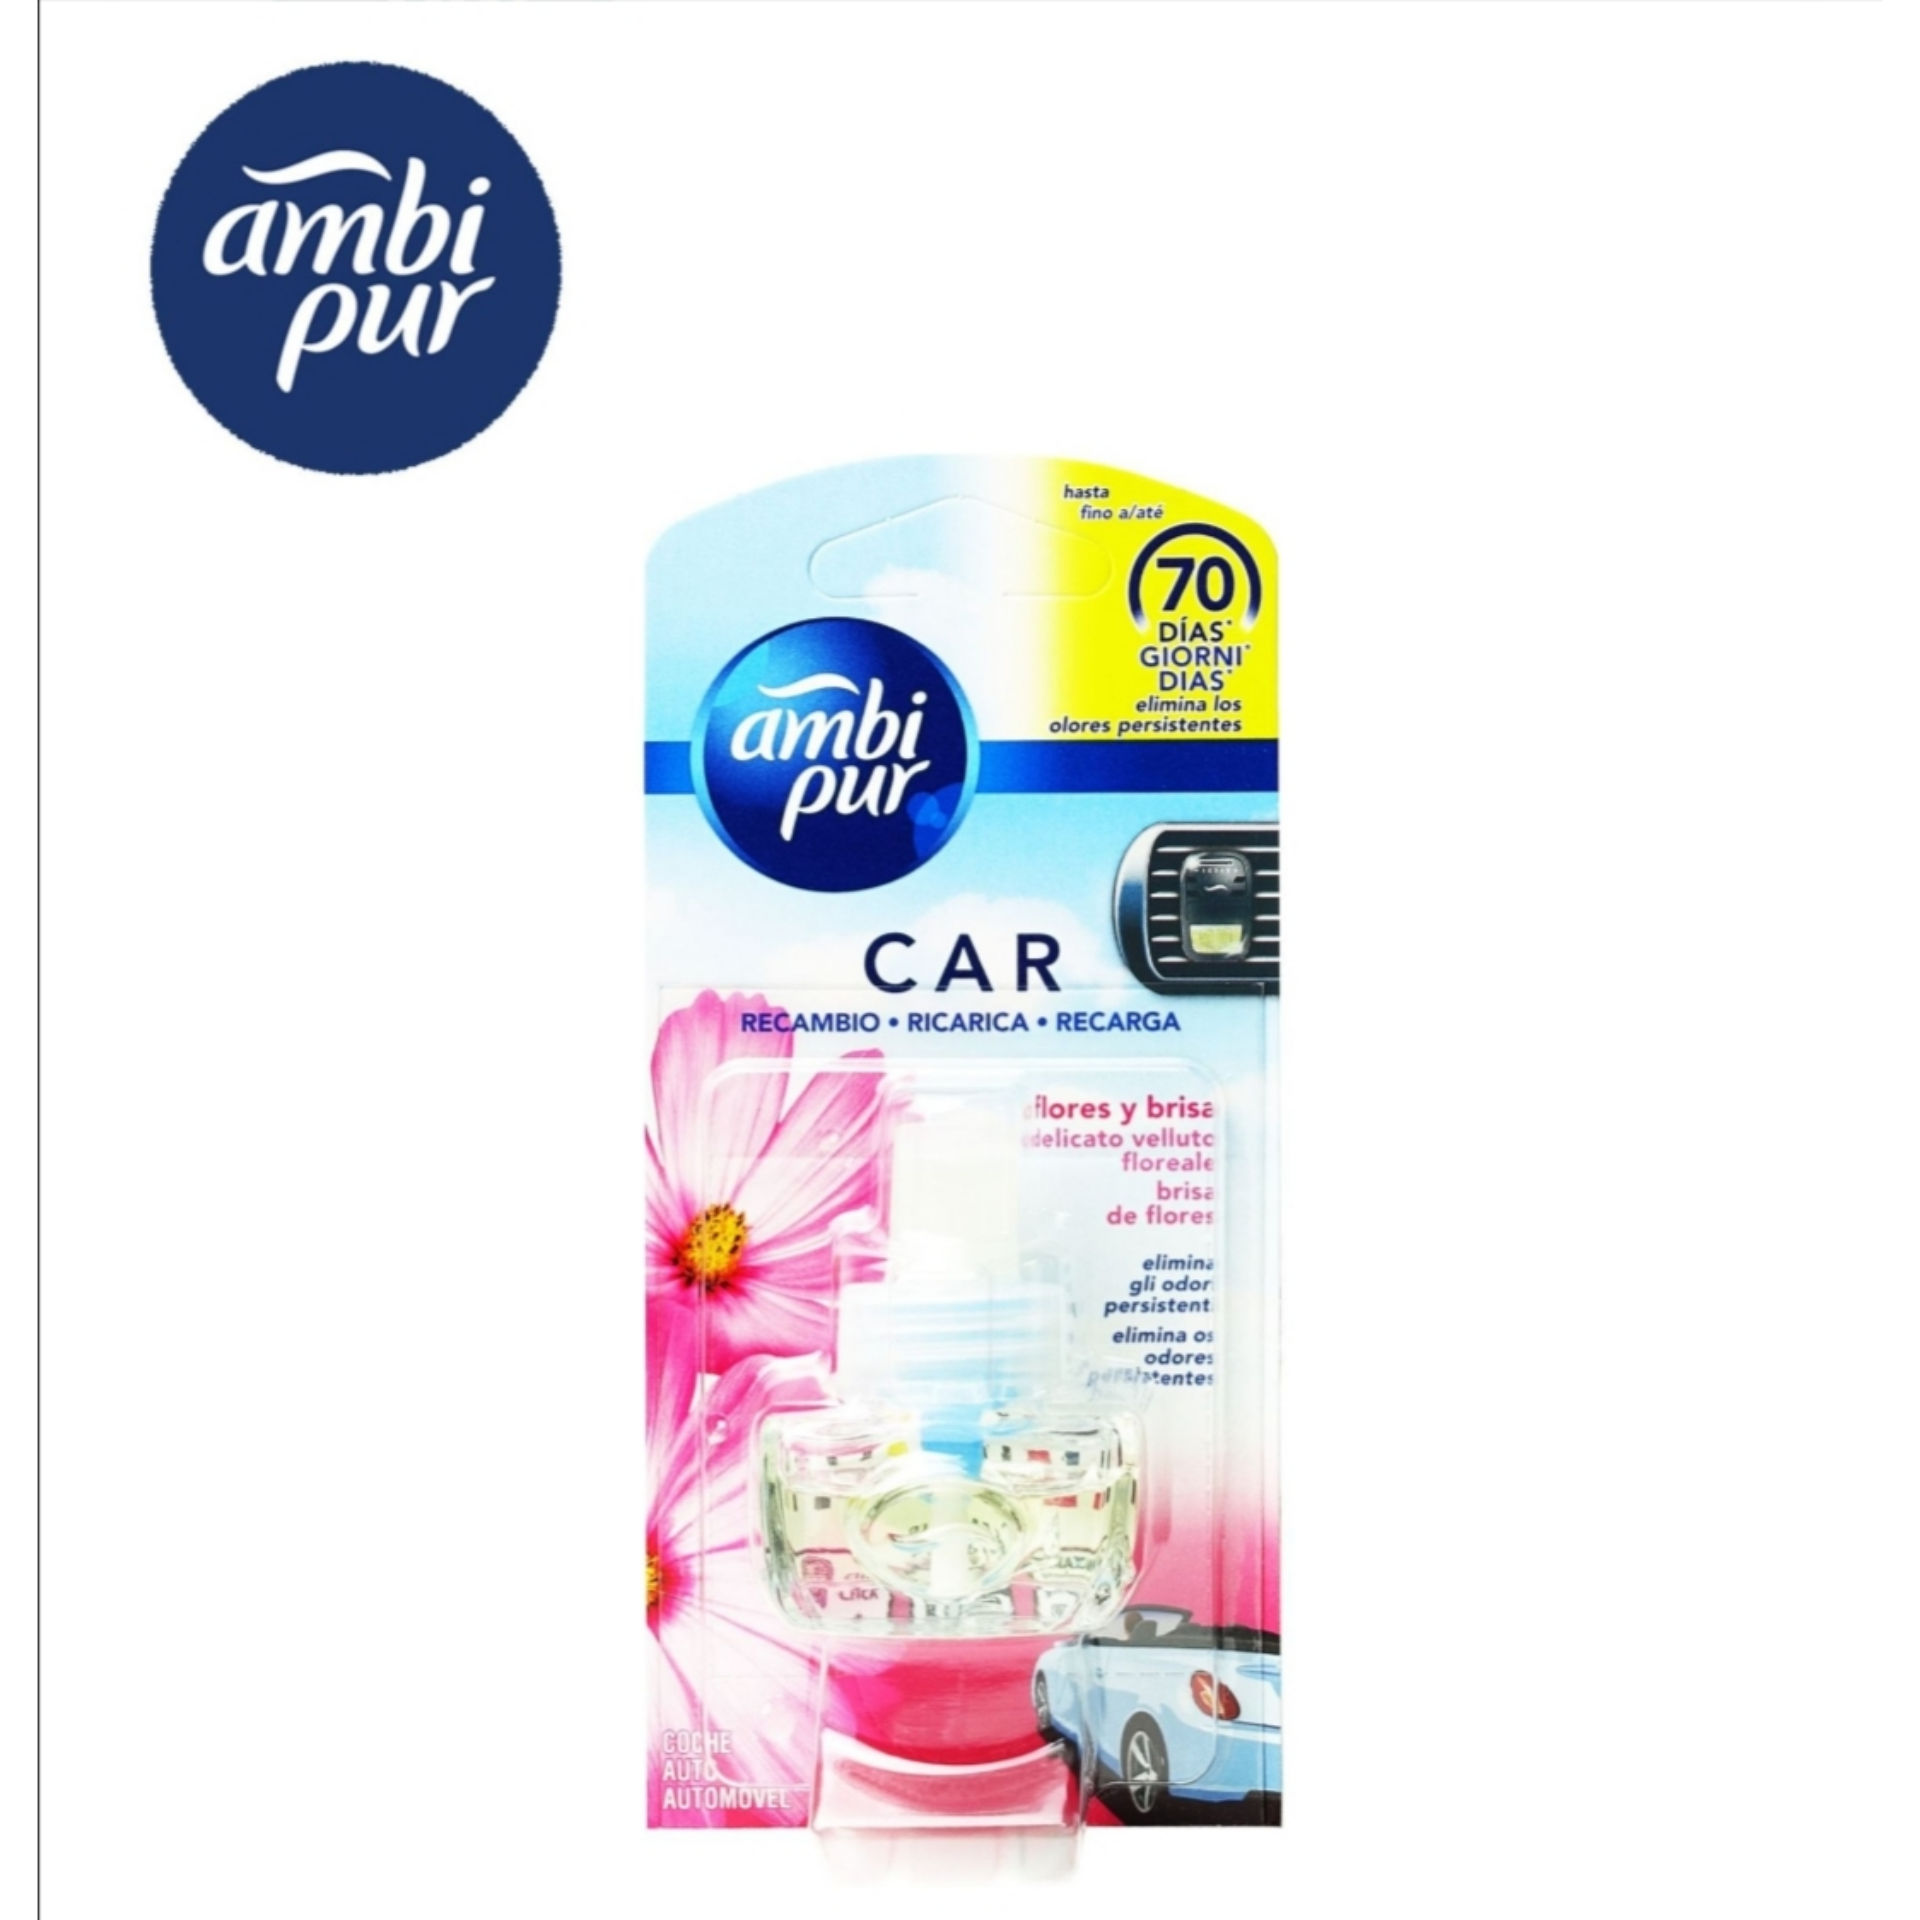 AMBIPUR CAR RICARICA FIORI/FLOREAL-8985-Ambipur